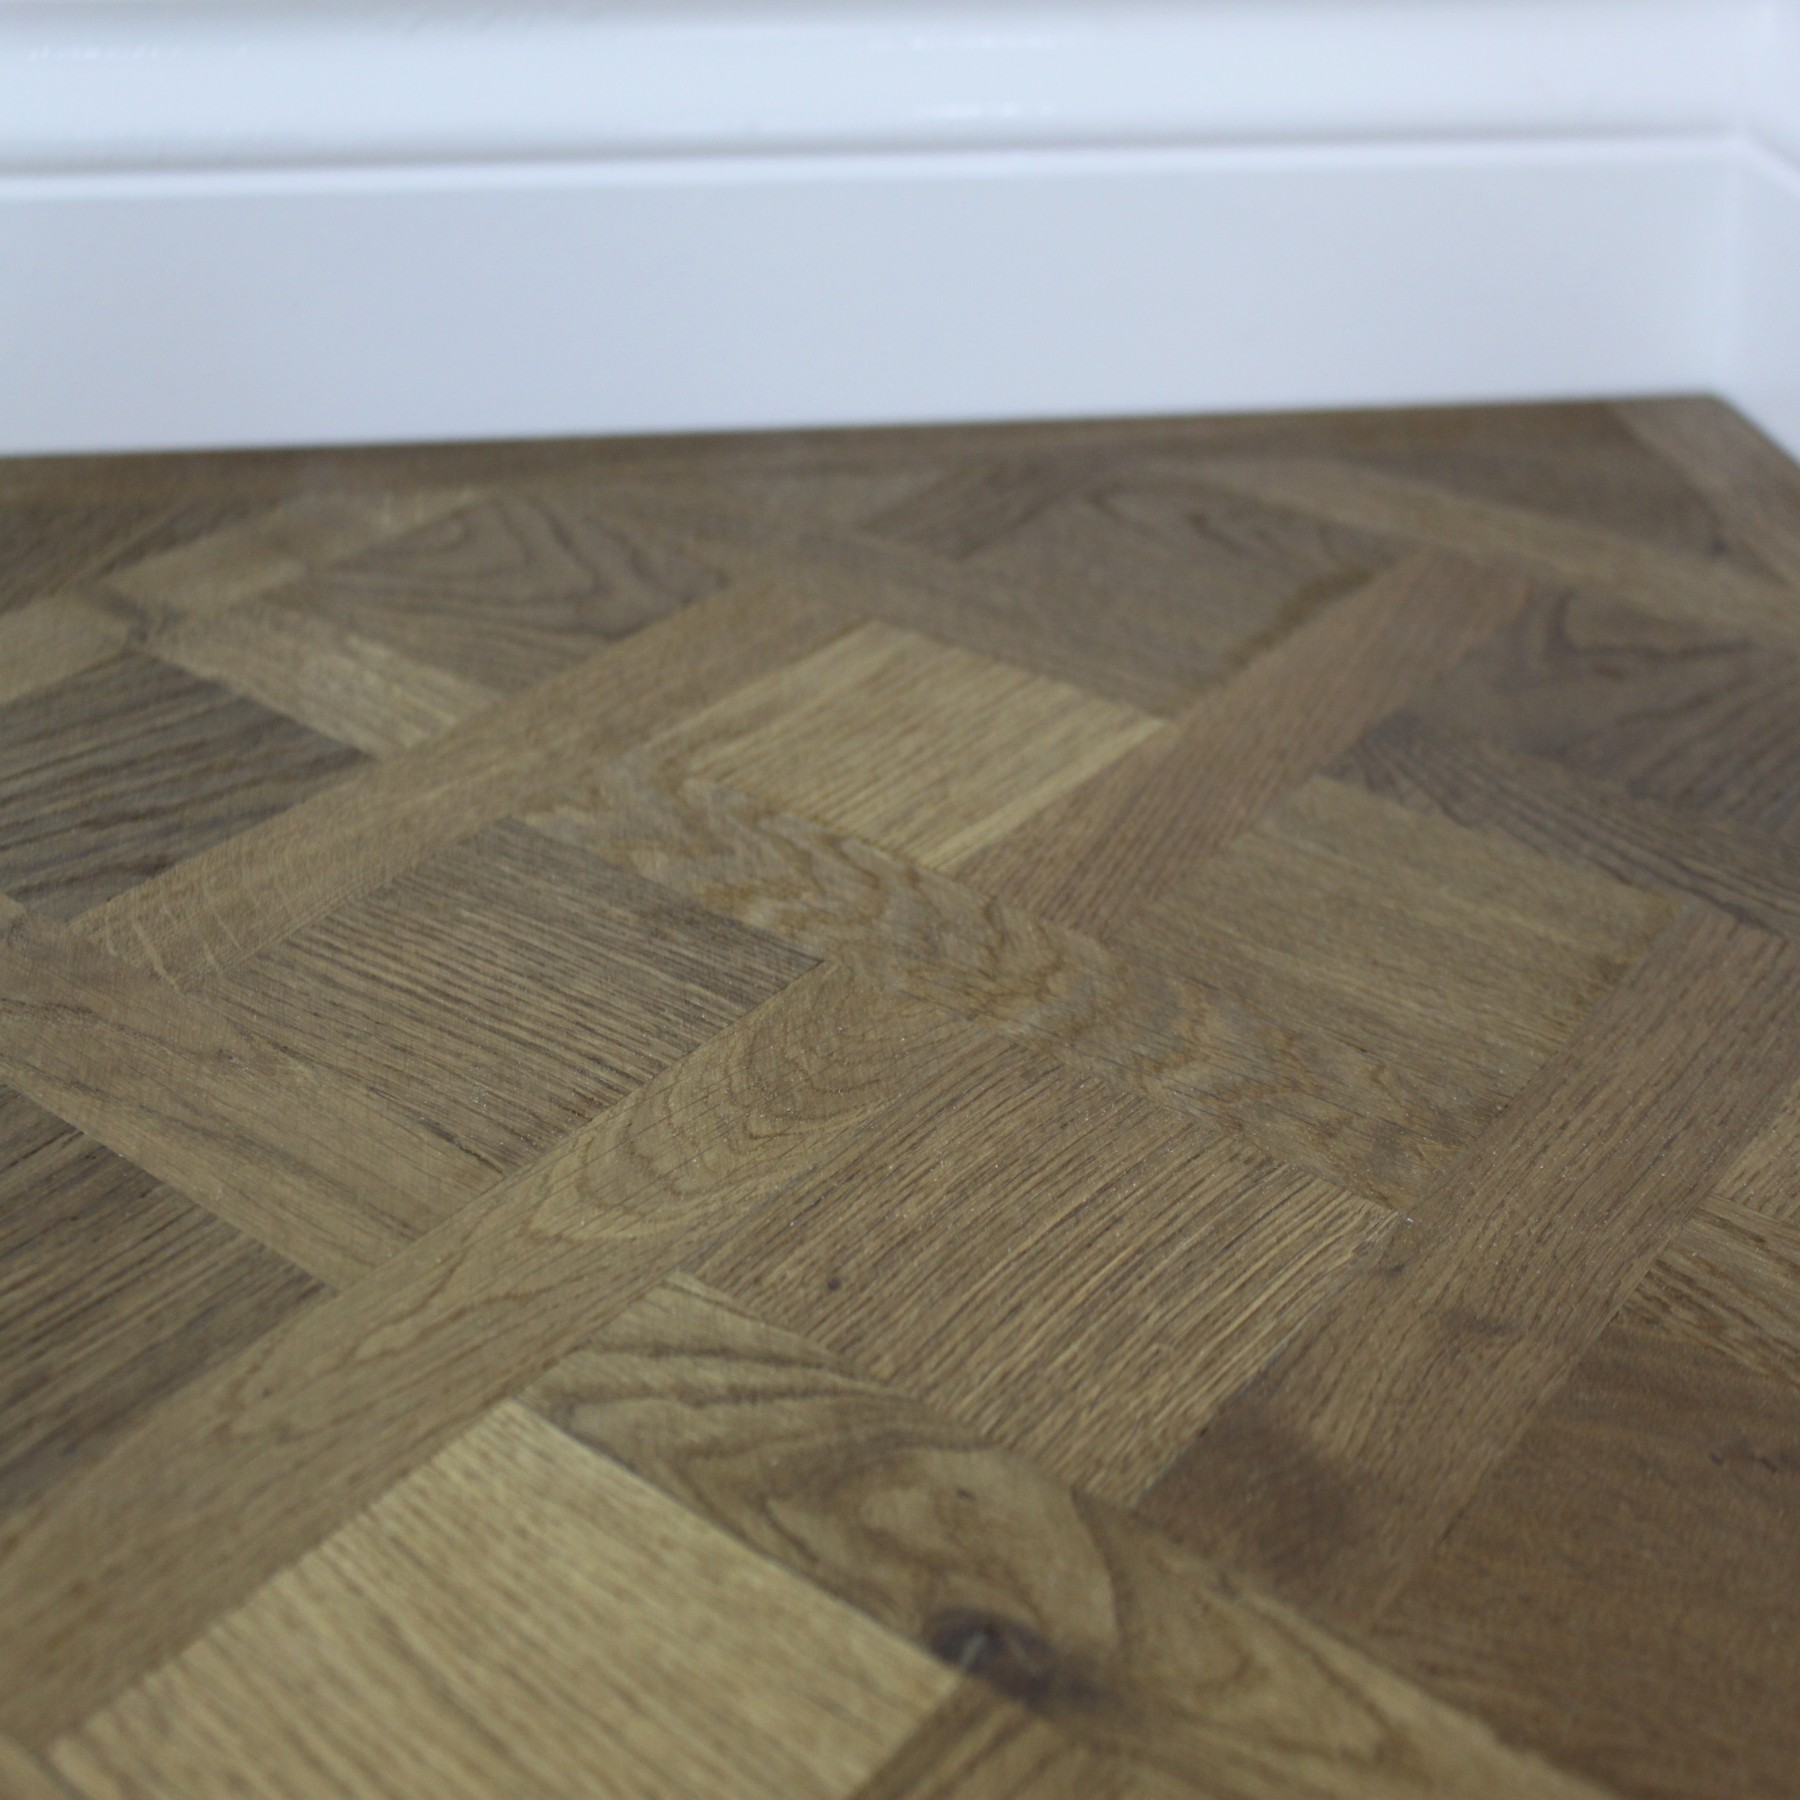 Maxi Versailles Panels  Smoked Oak Natural Oiled  Engineered Wood Flooring  580x580mm